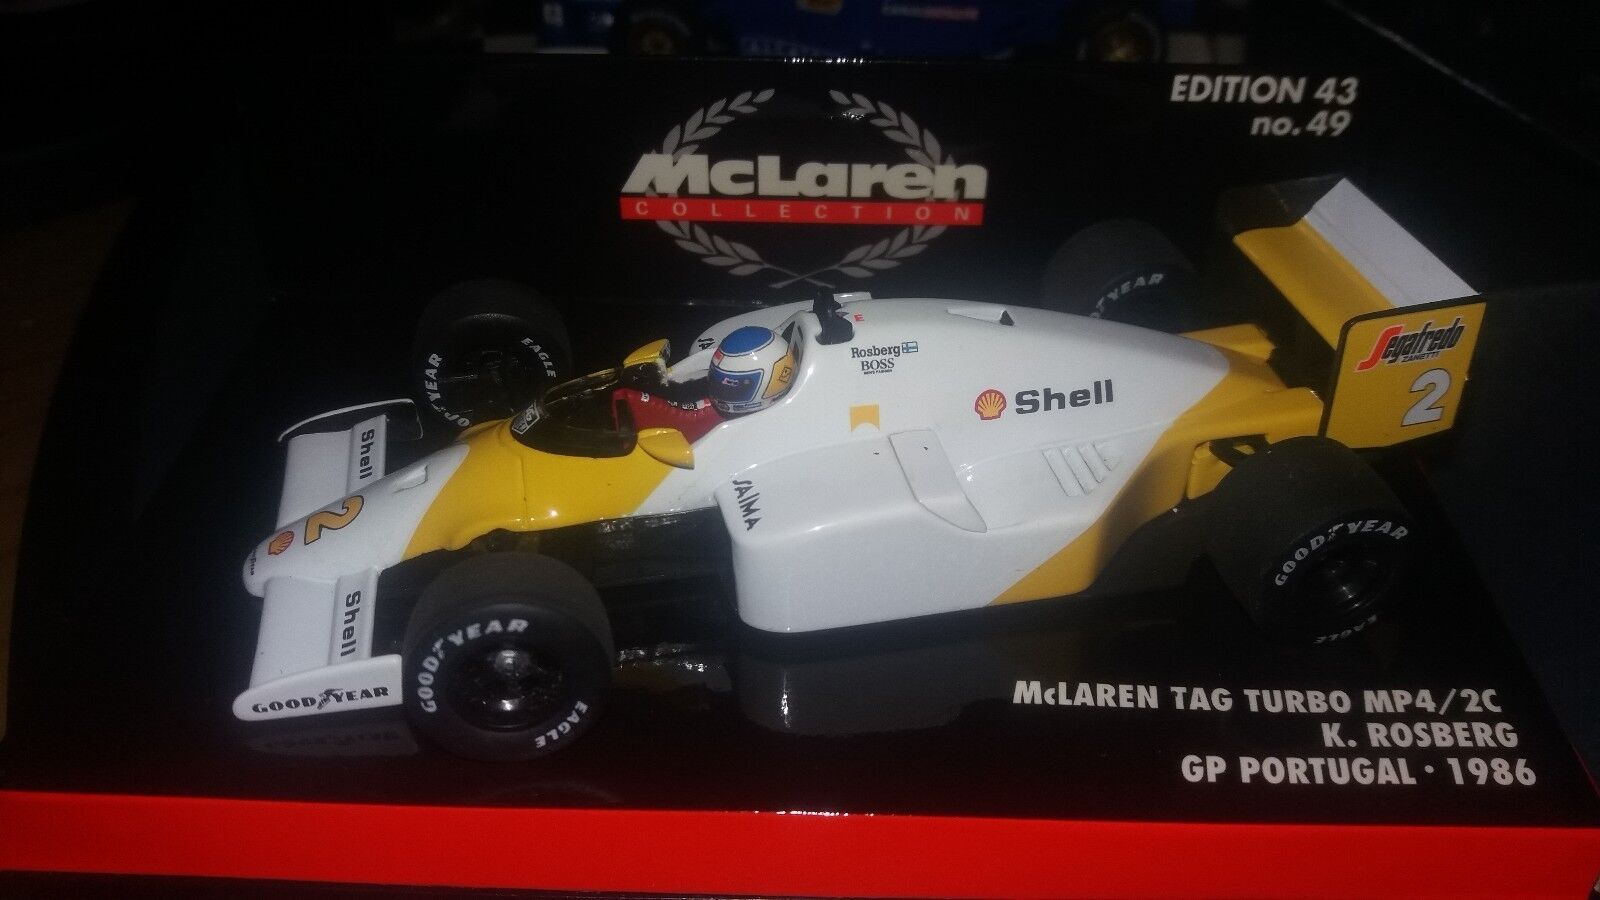 Minichamps 1 43 McLaren TAG Turbo MP4 2C  2  K.Rosberg  GP Portugal 1986